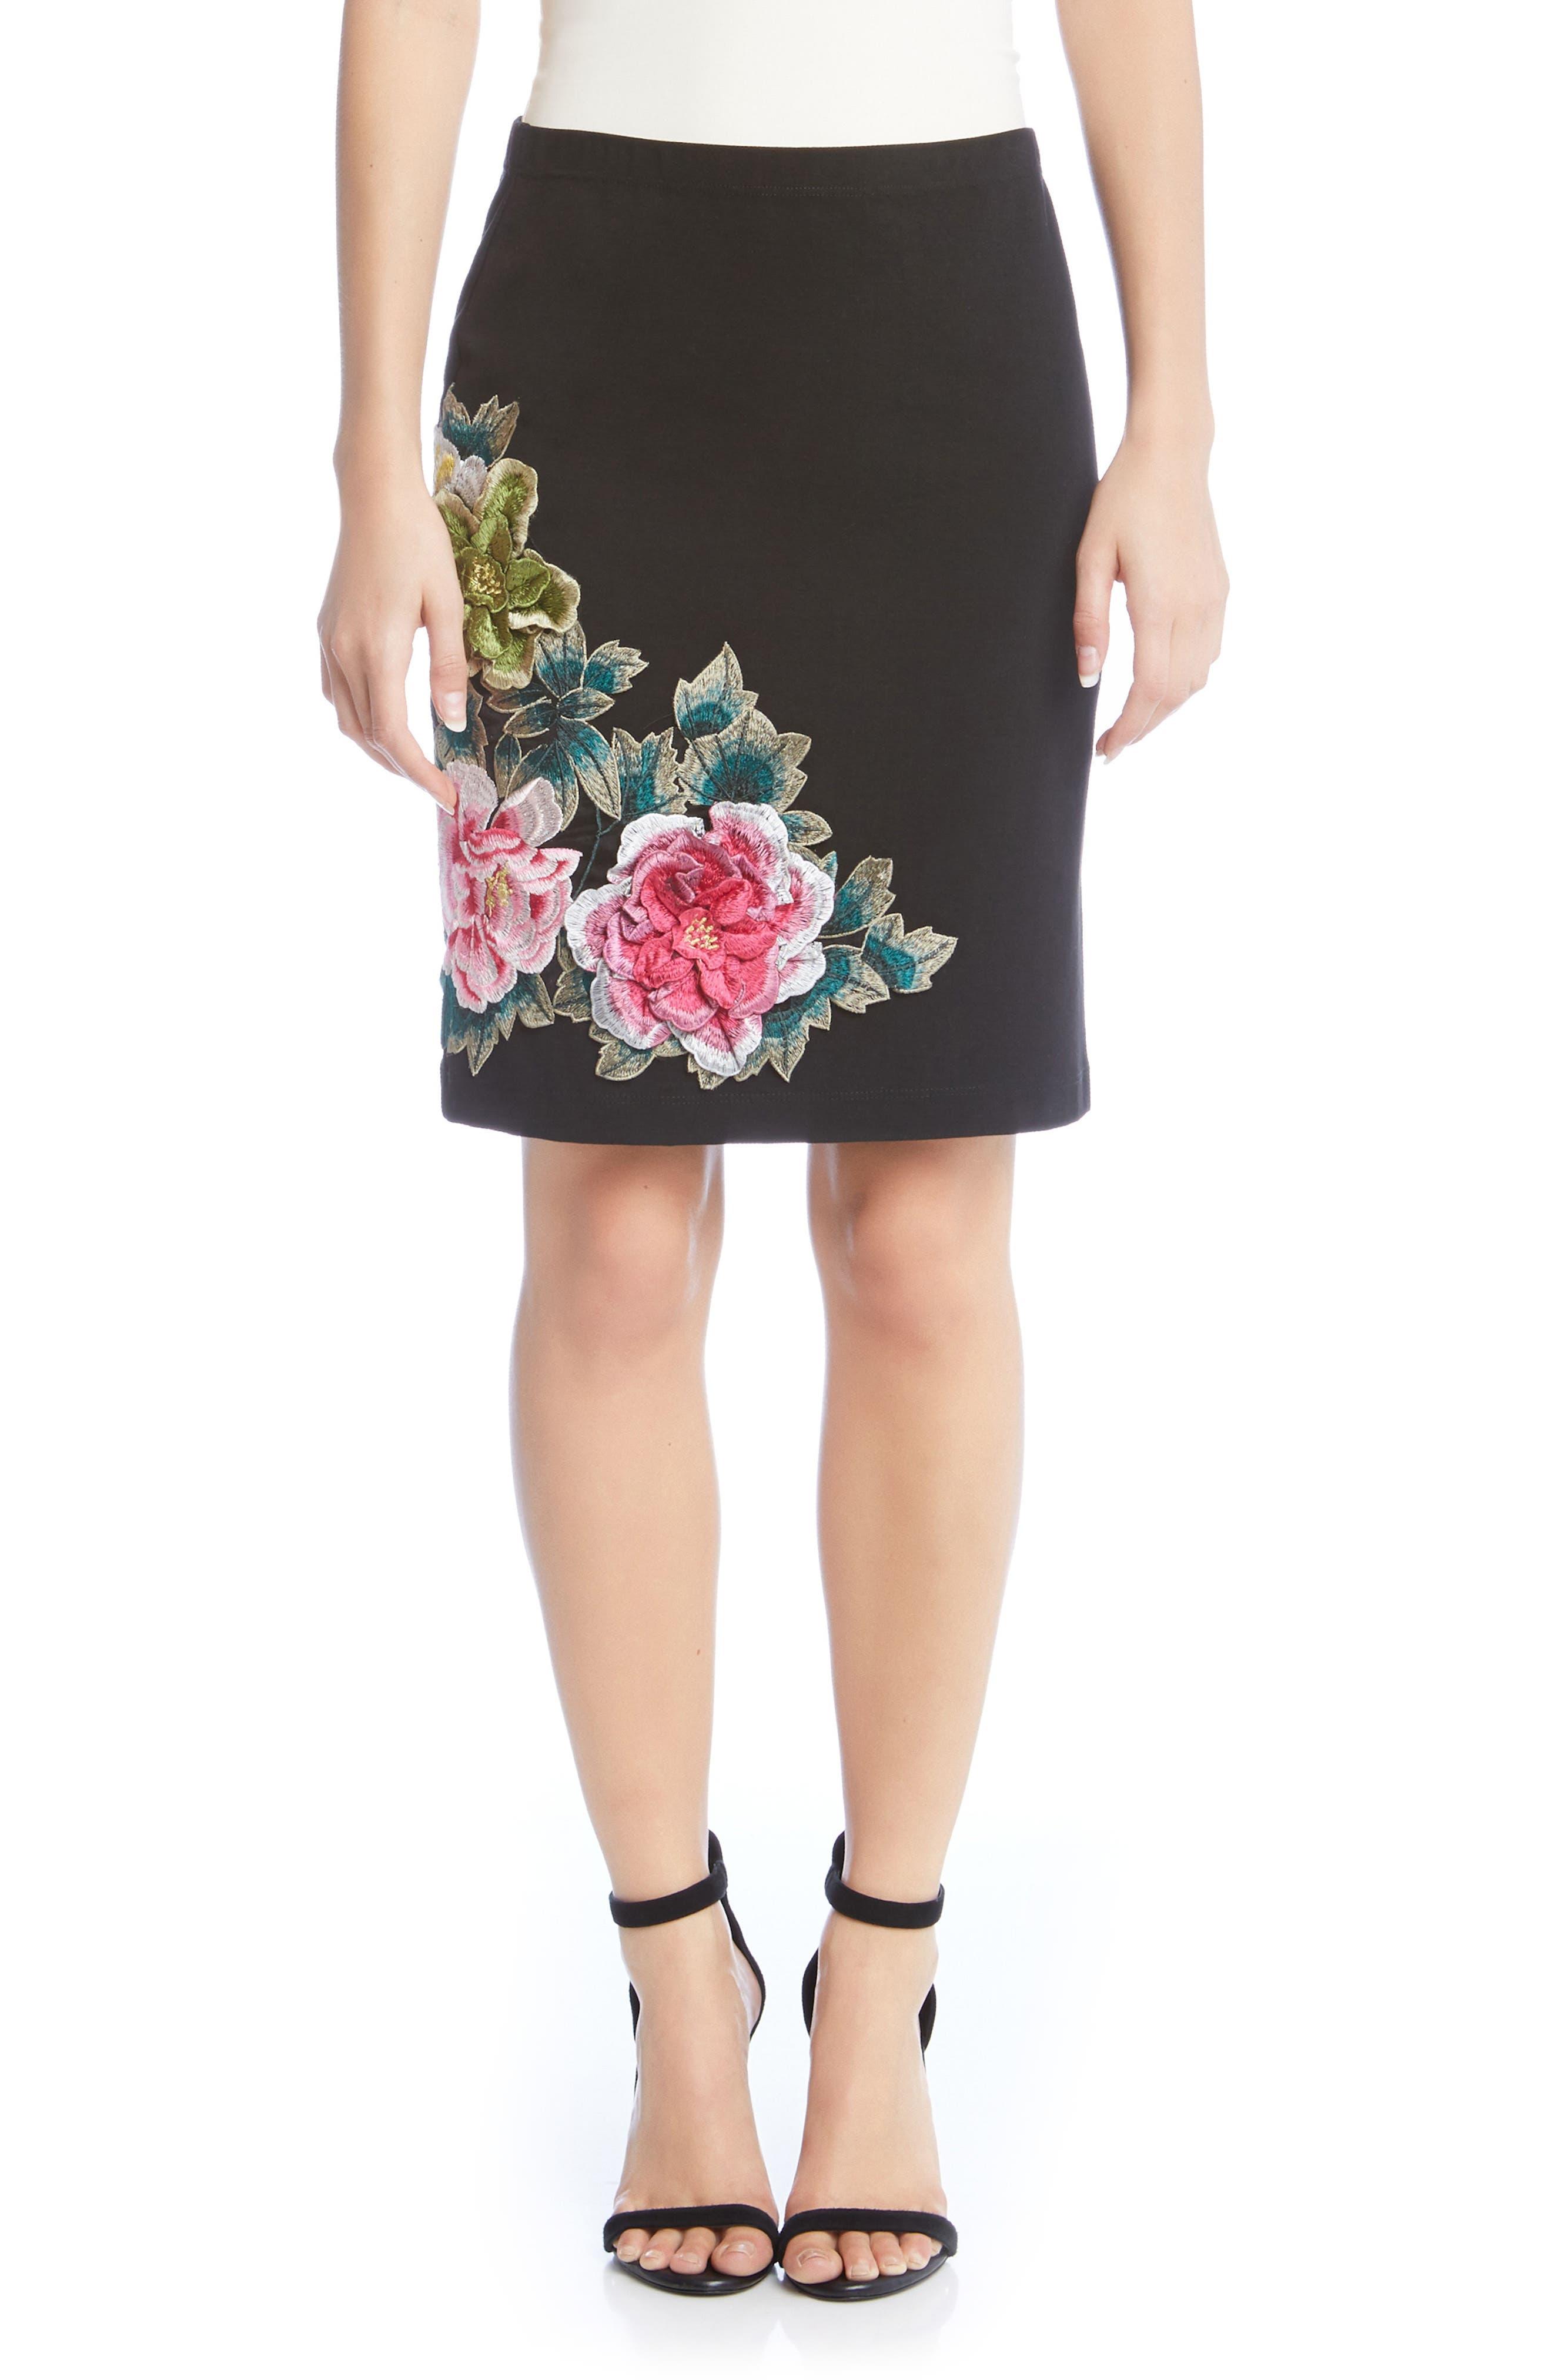 Karen Kane Textured Floral Skirt